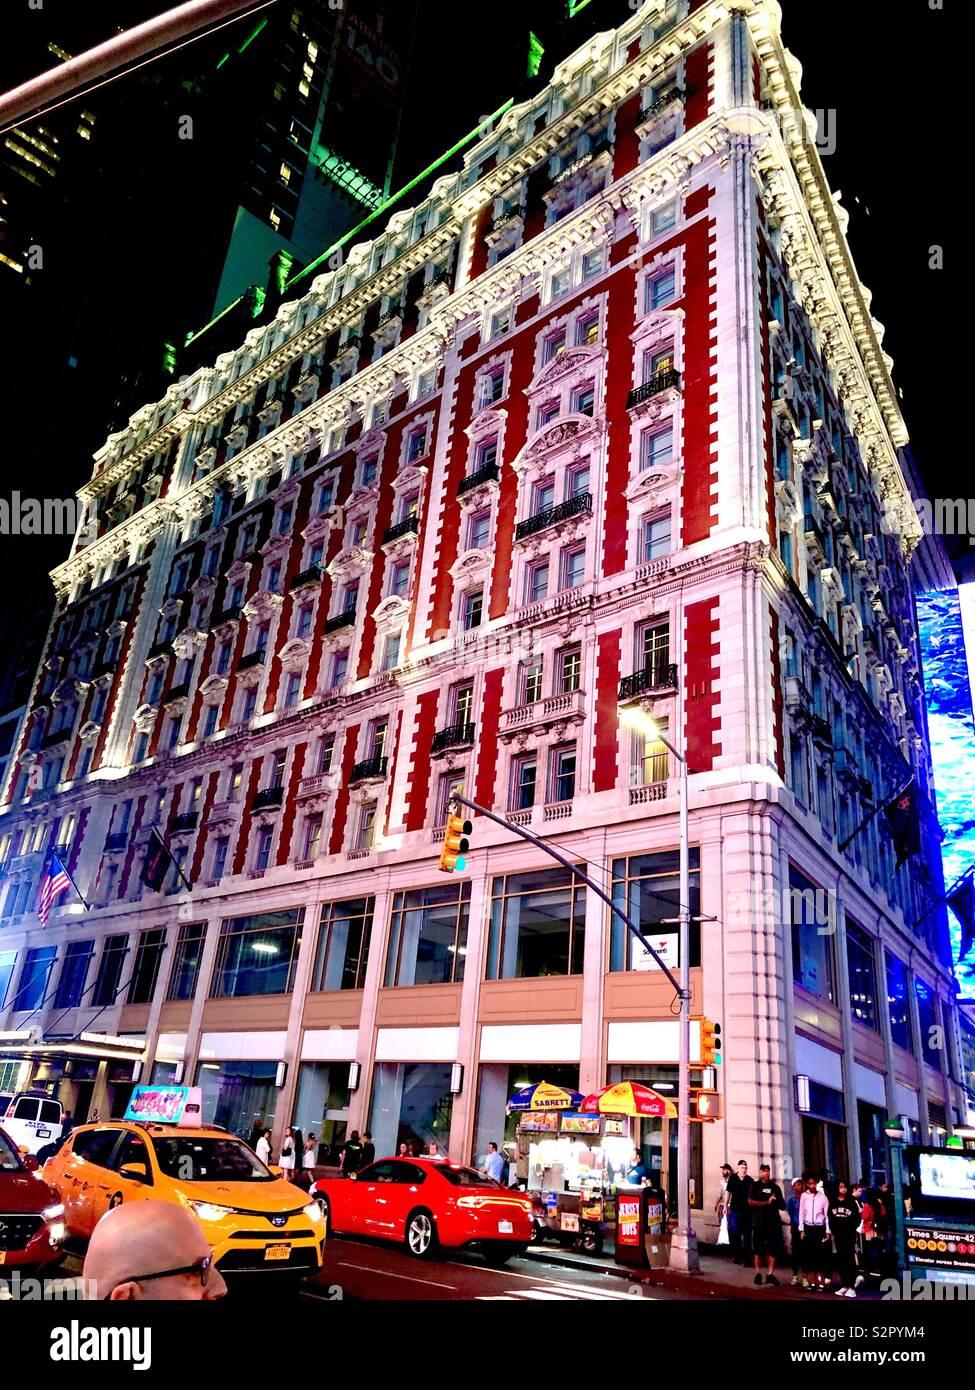 Knickerbocker Hotel 42nd Street New York City near Times Square with traffic at night Stock Photo